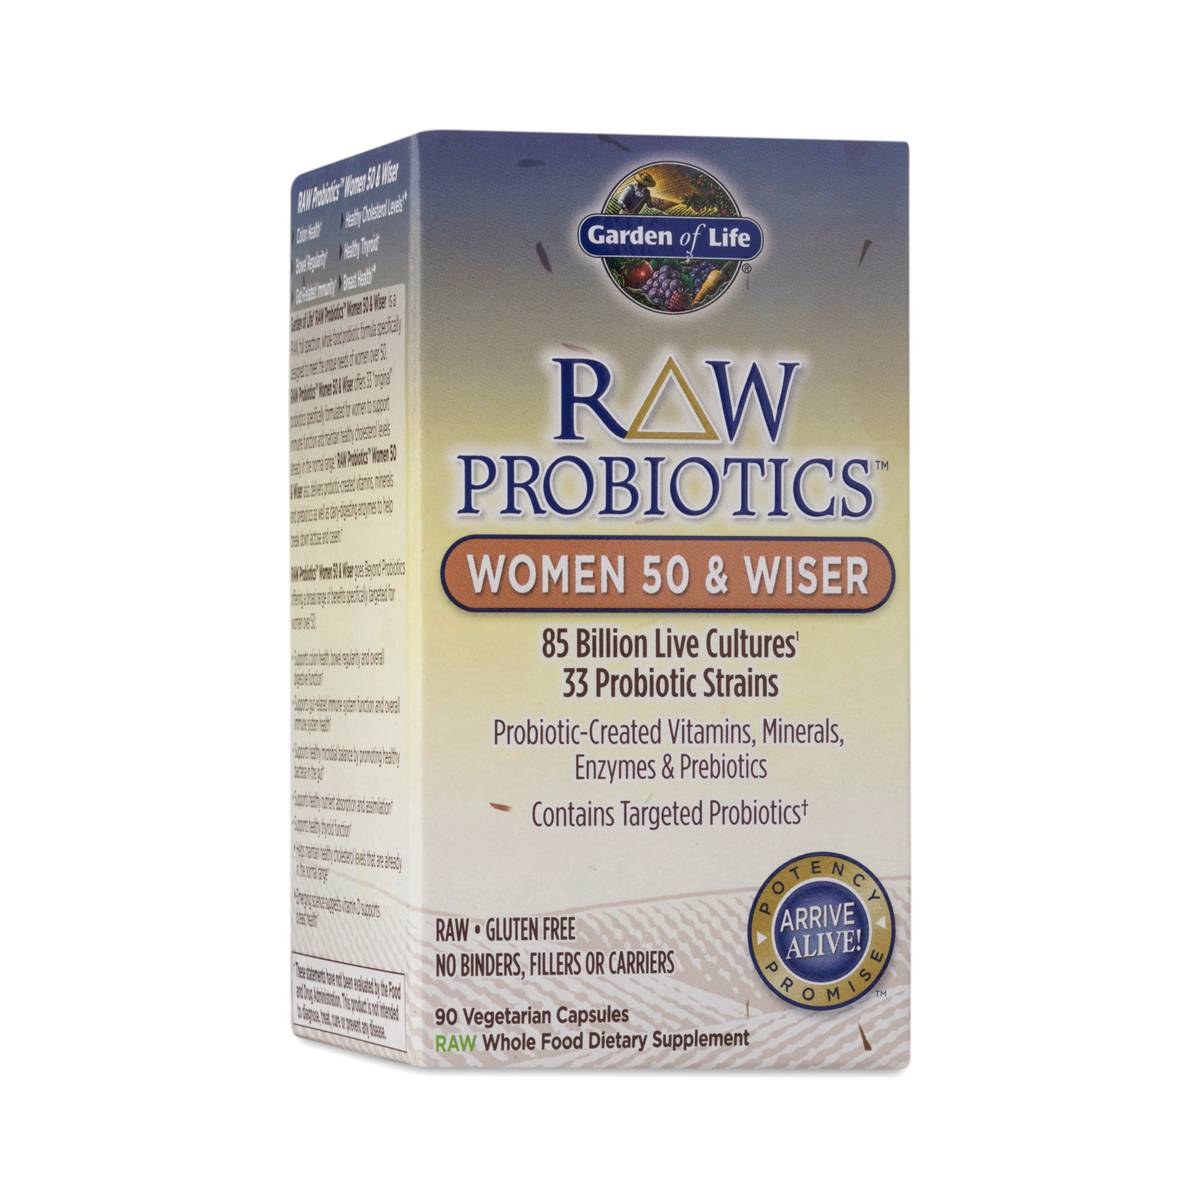 Raw Probiotics For Women 50 Wiser By Garden Of Life Thrive Market